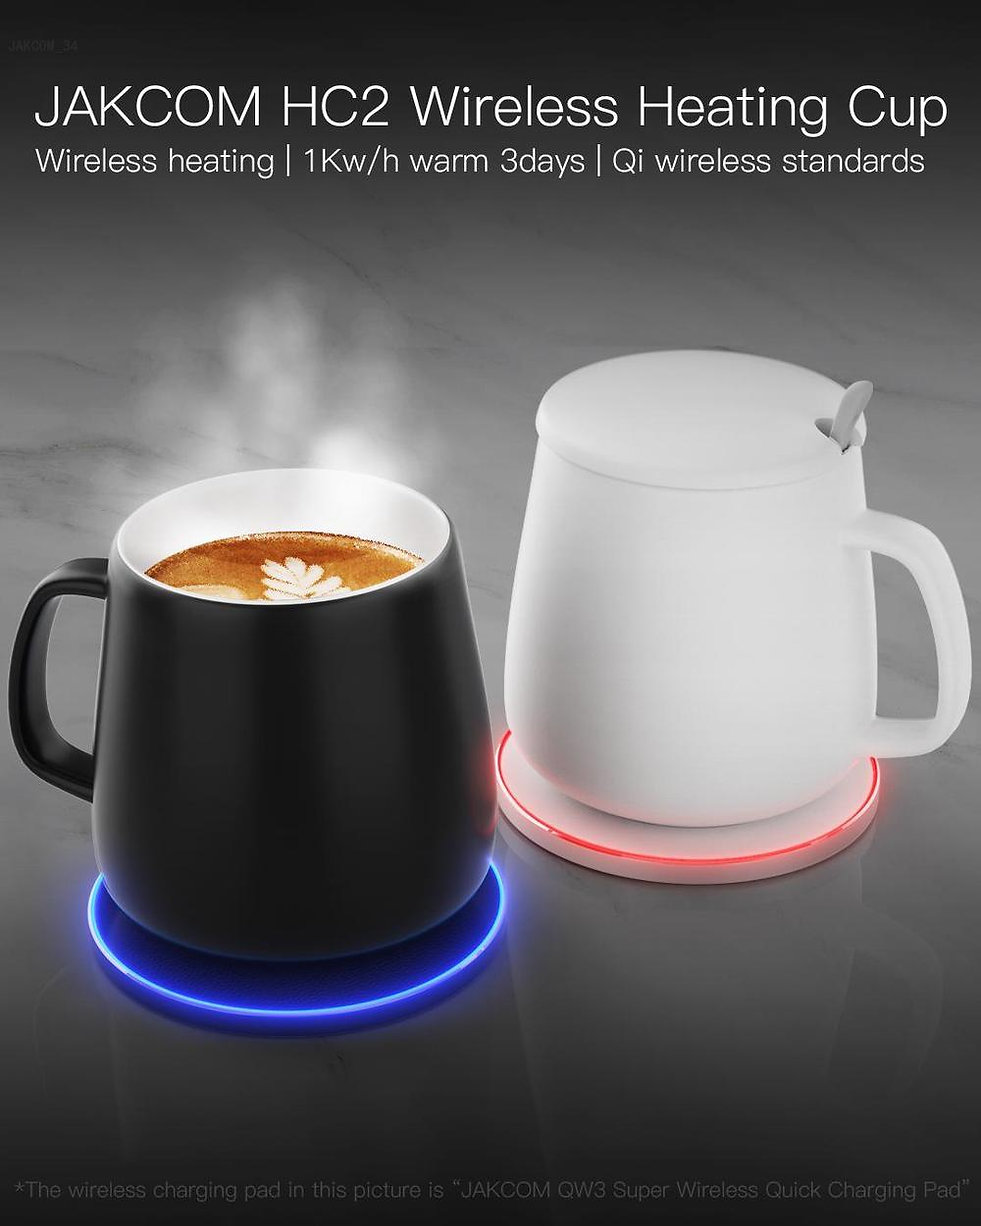 Wireless Heating Cup 13 Shoppiny.jpg